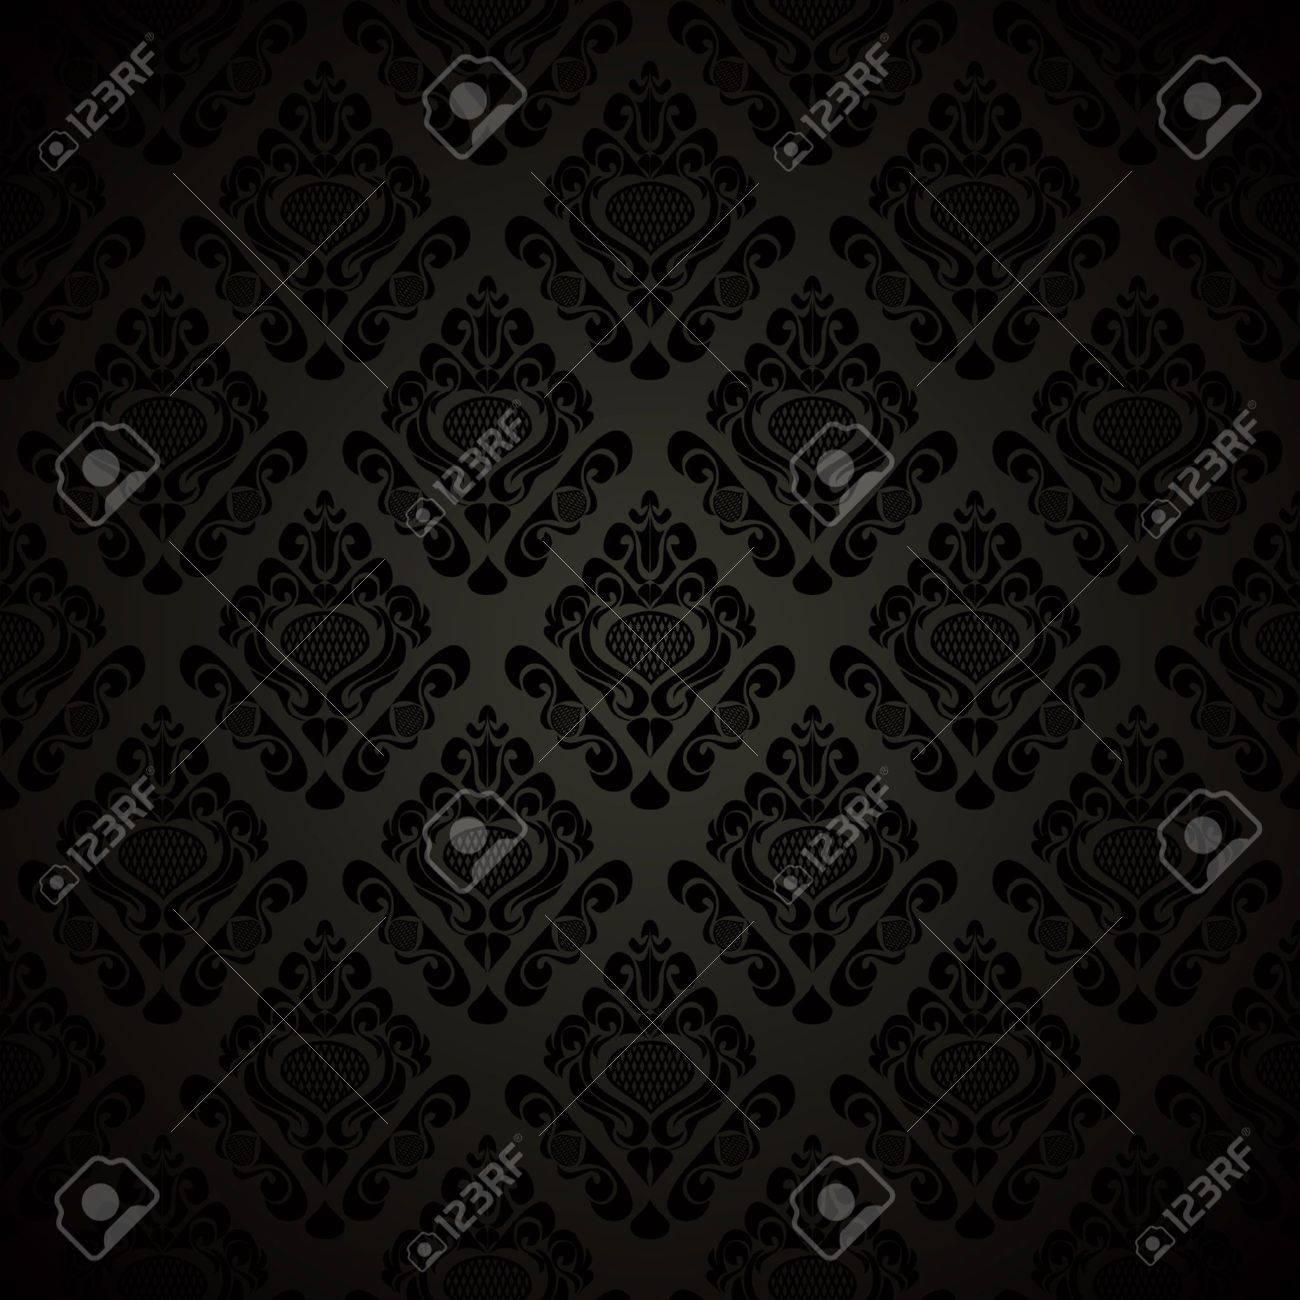 Seamless black wallpaper - style retro. Vector illustration(EPS10). - 13298189